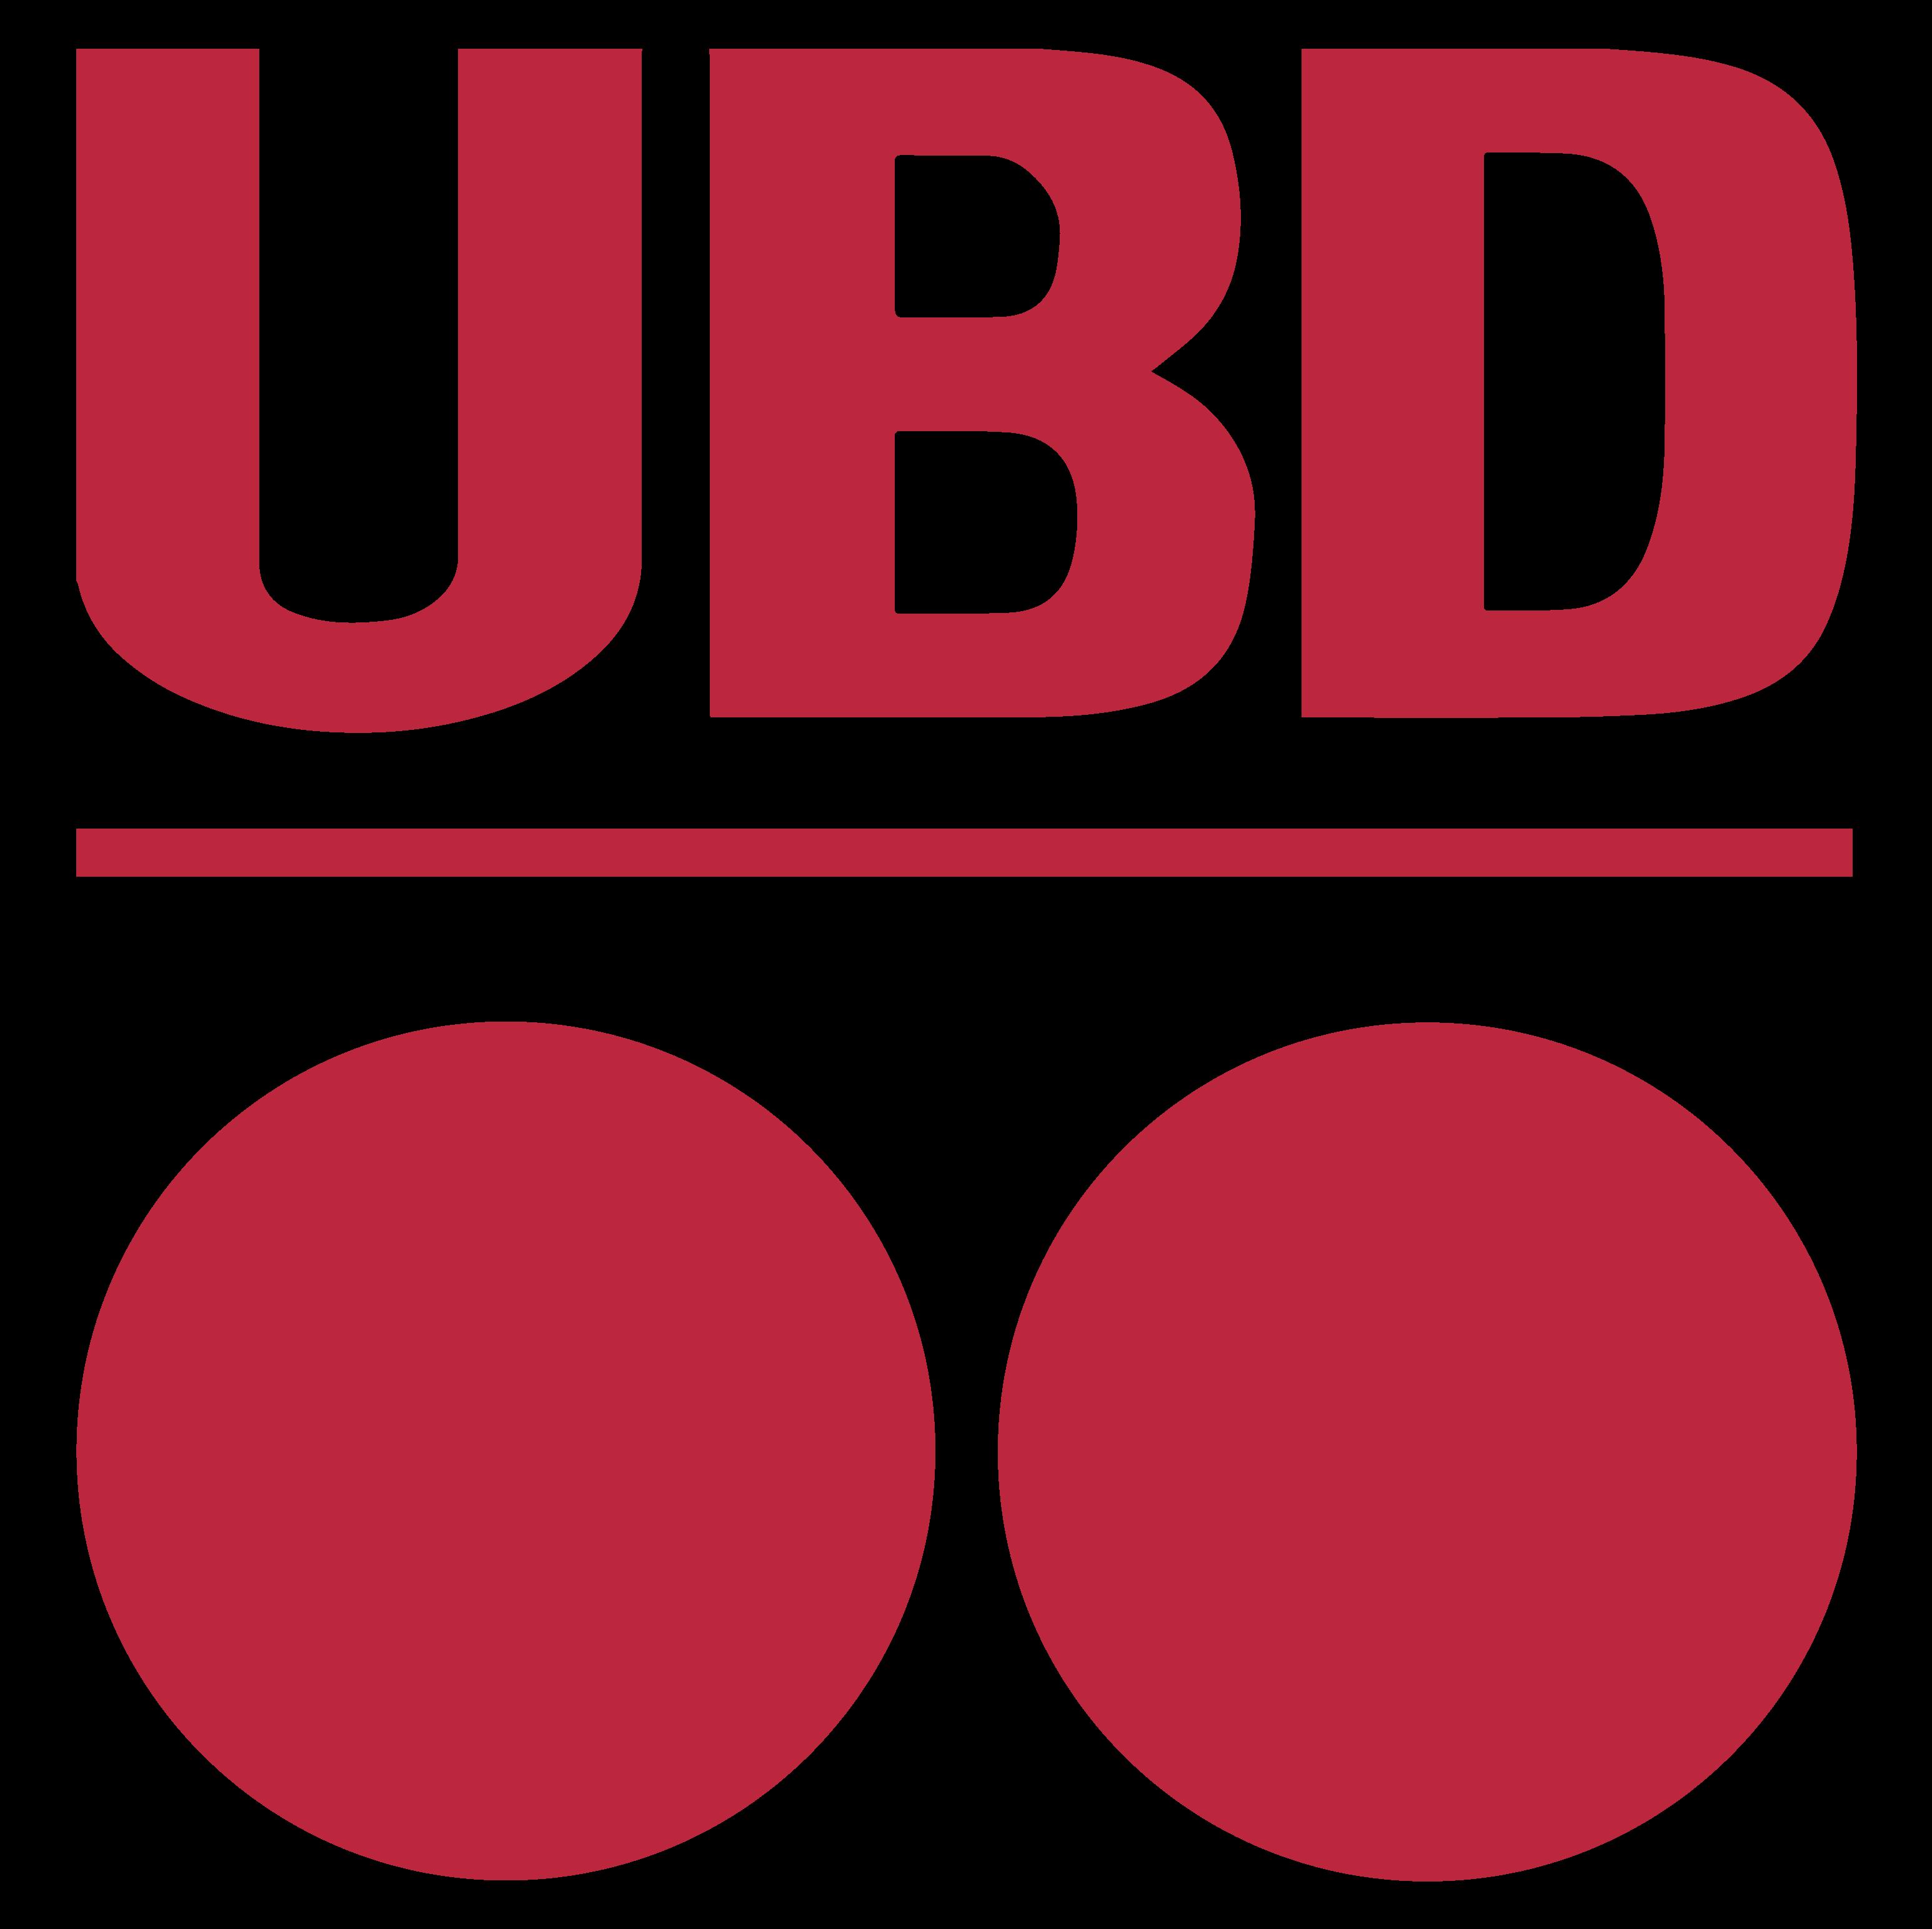 UBD – Ugebladsdistributionen